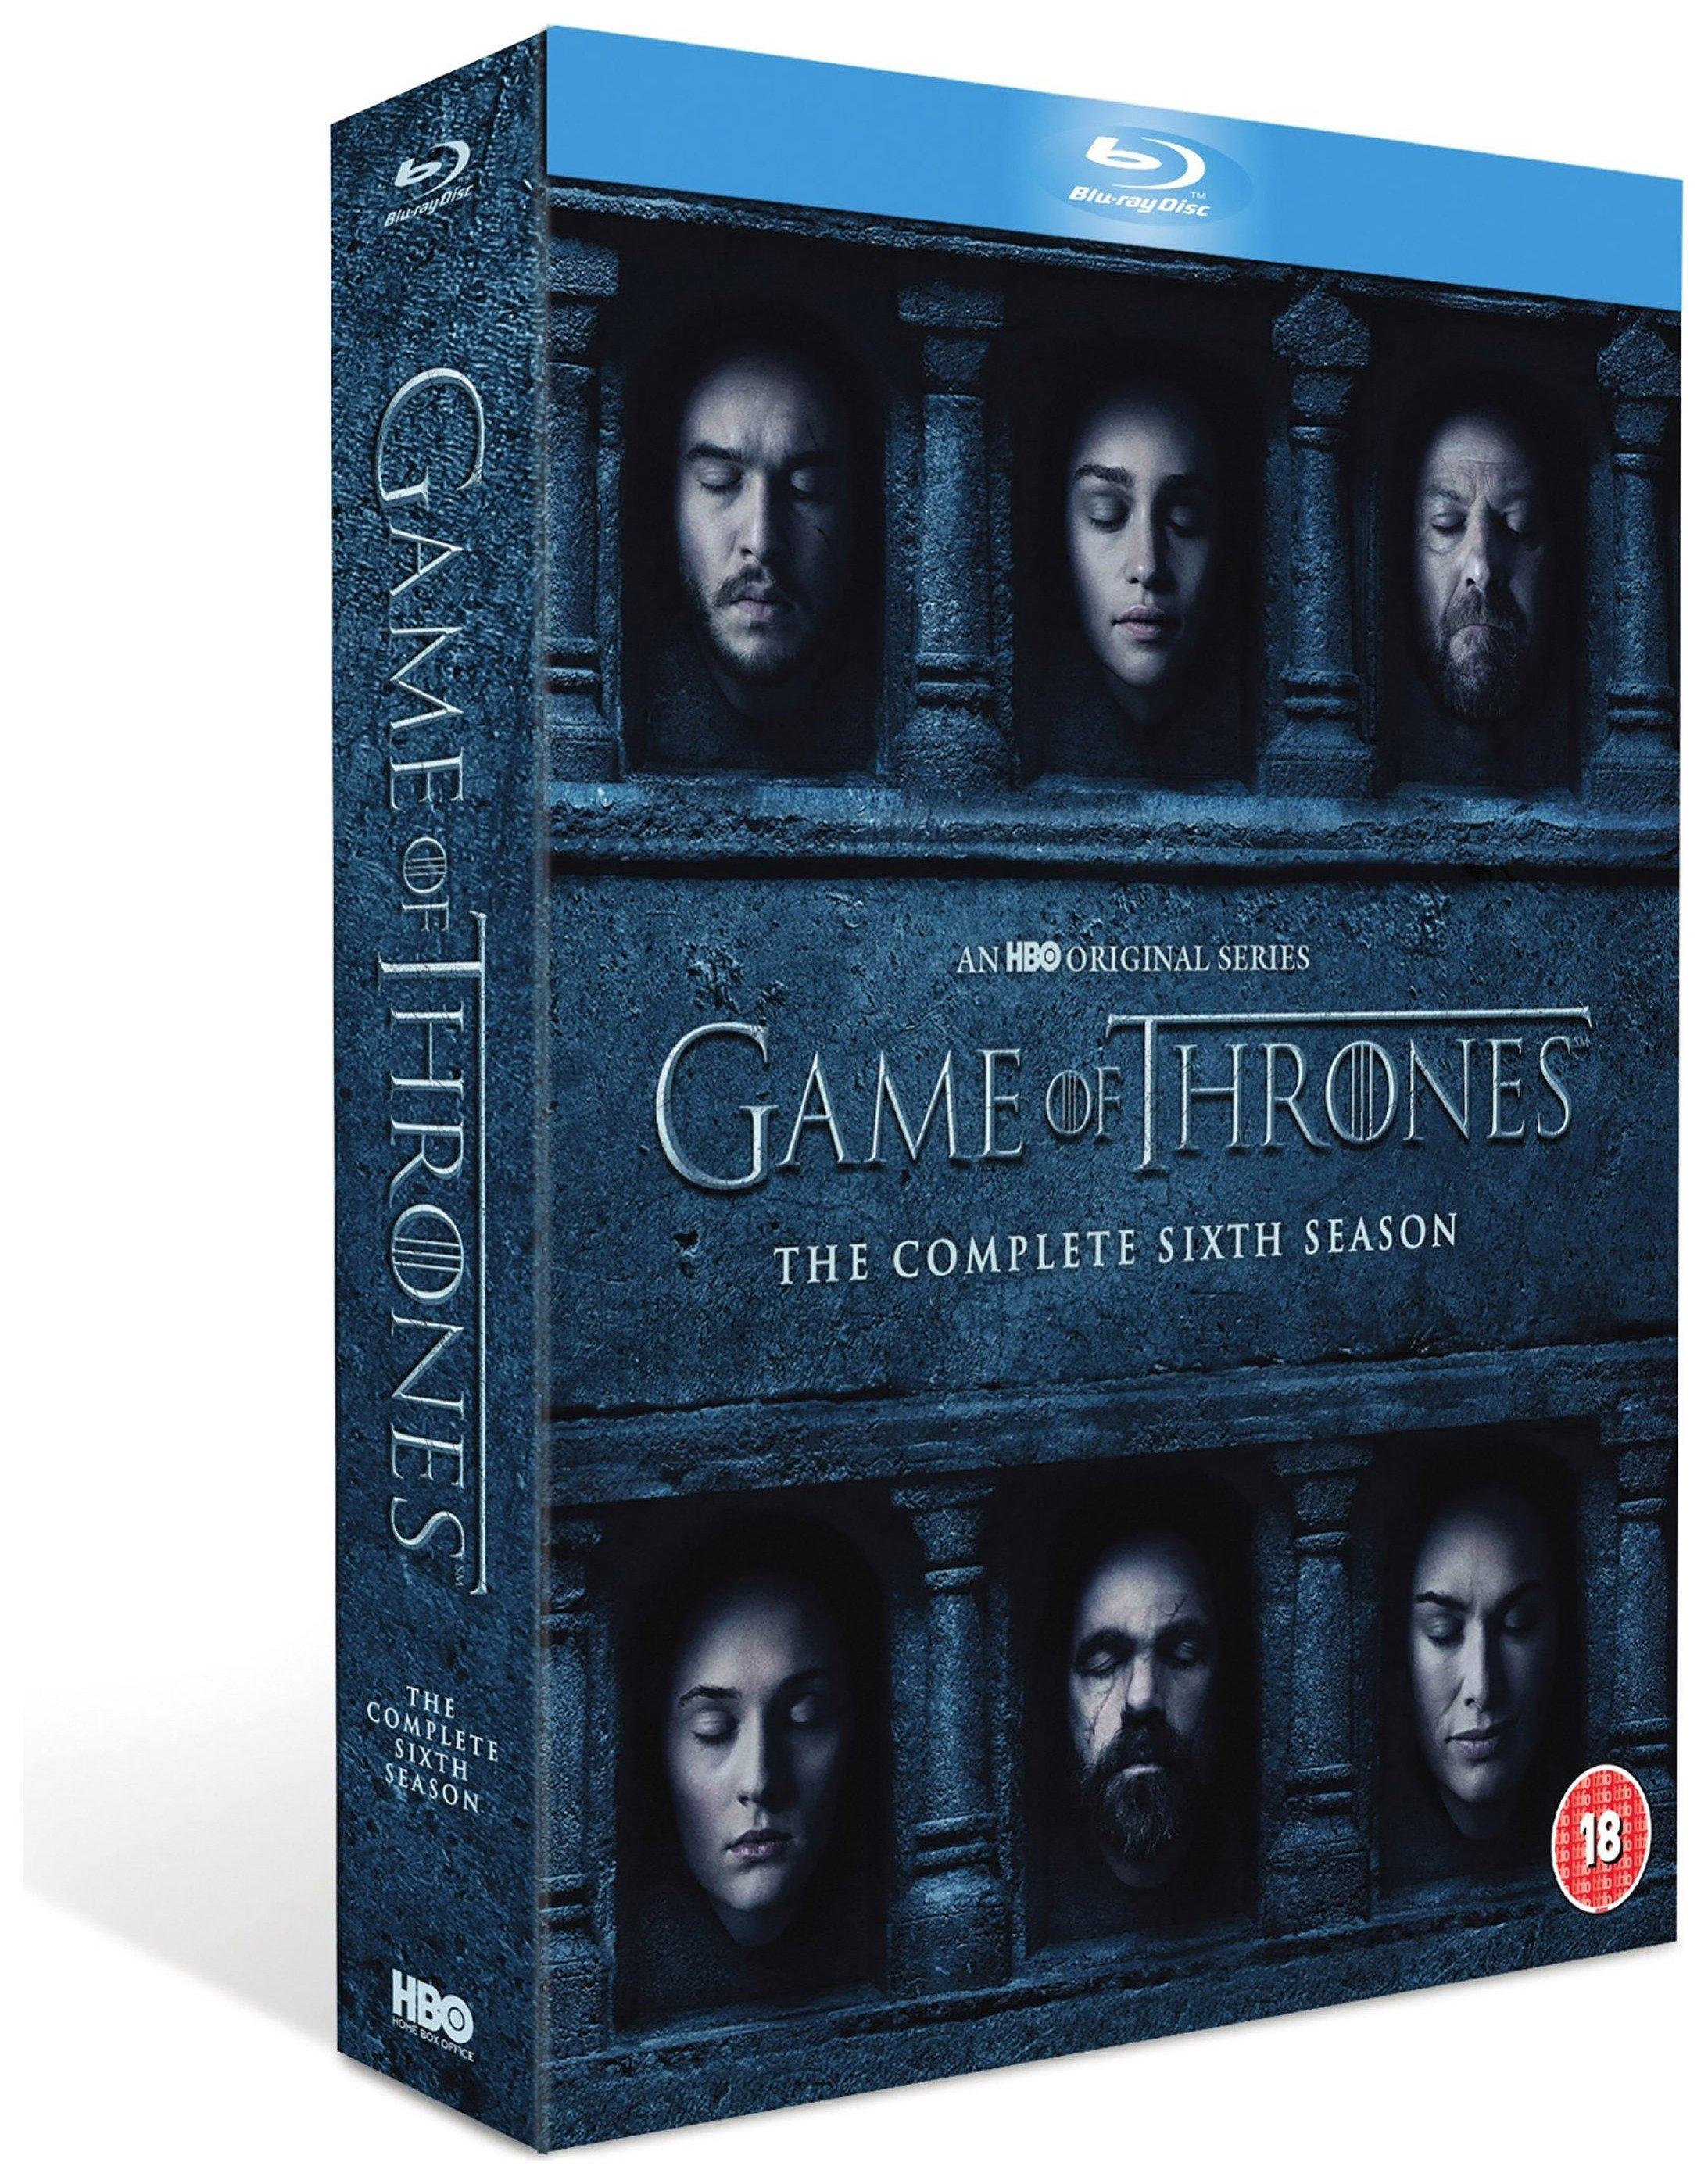 HBO Game of Thrones Season 6 Blu-ray DVD Boxset.